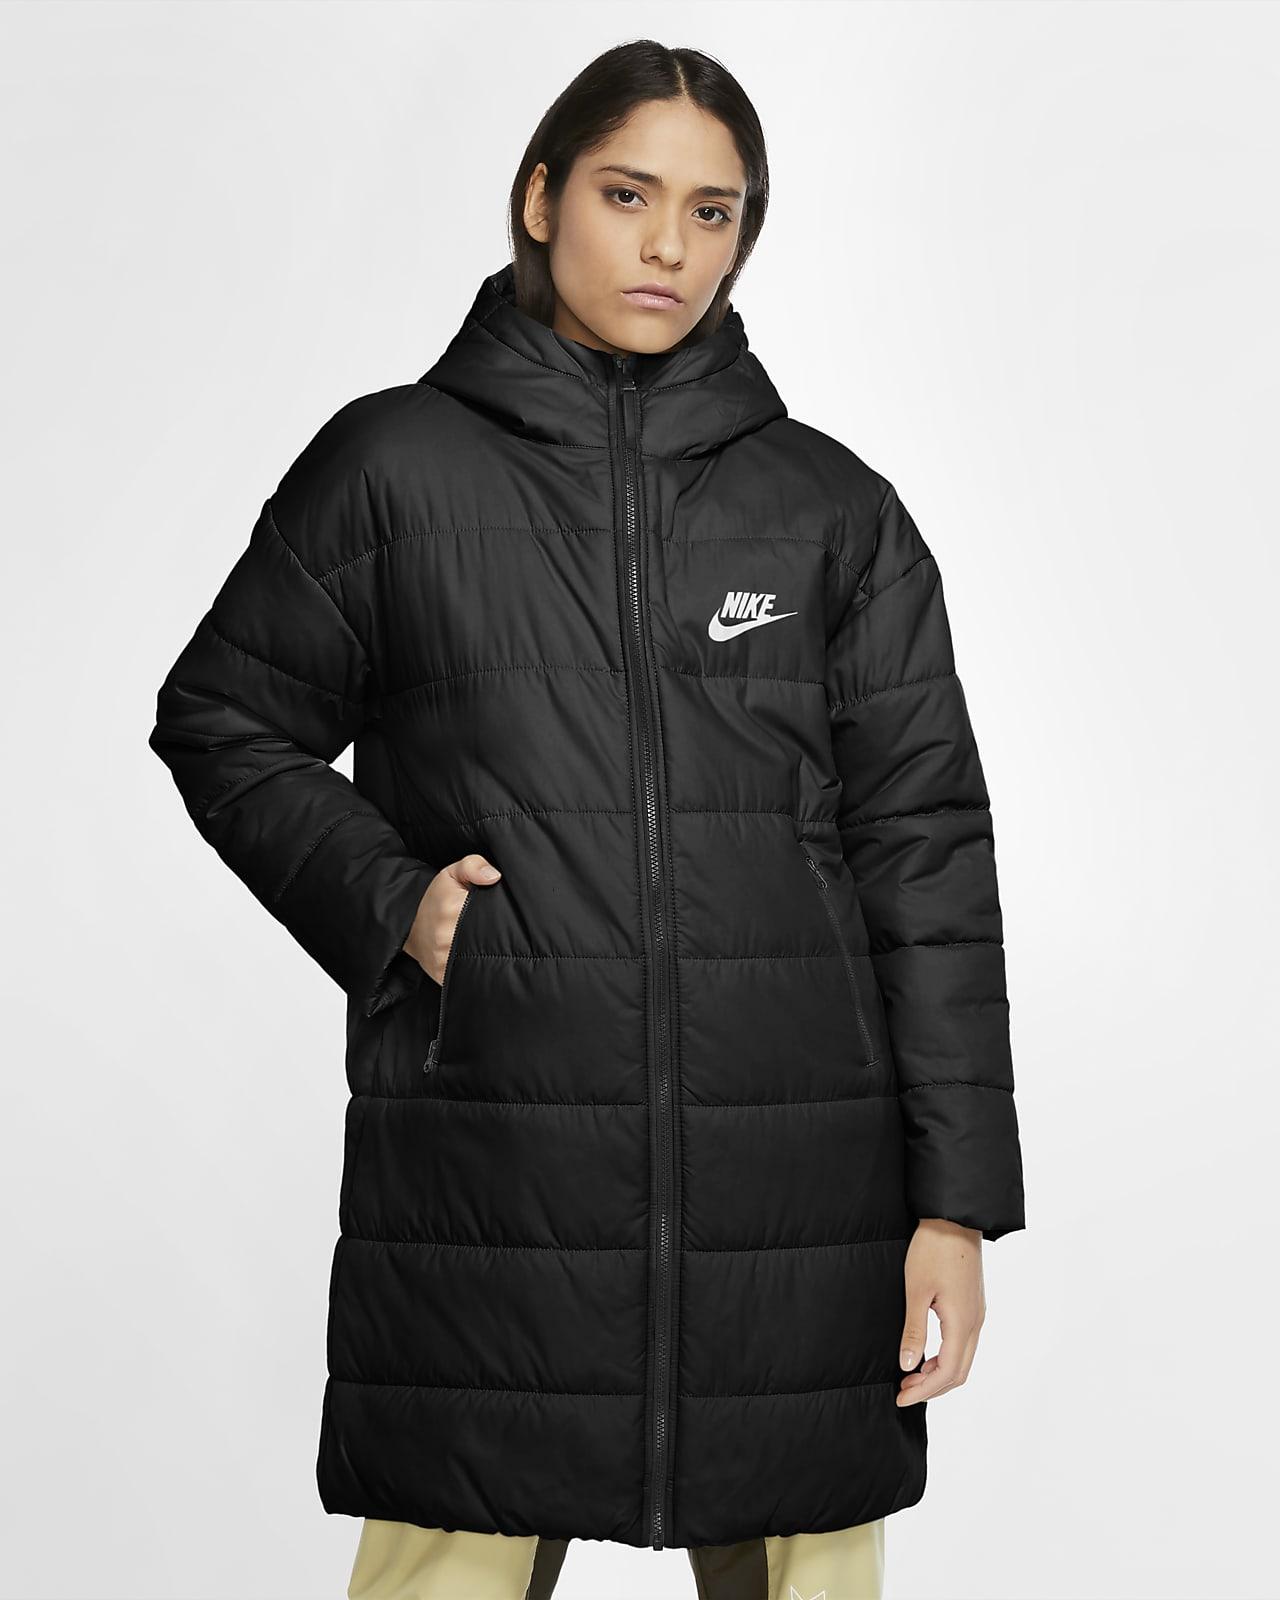 Nike Sportswear Synthetic-Fill Parca - Dona